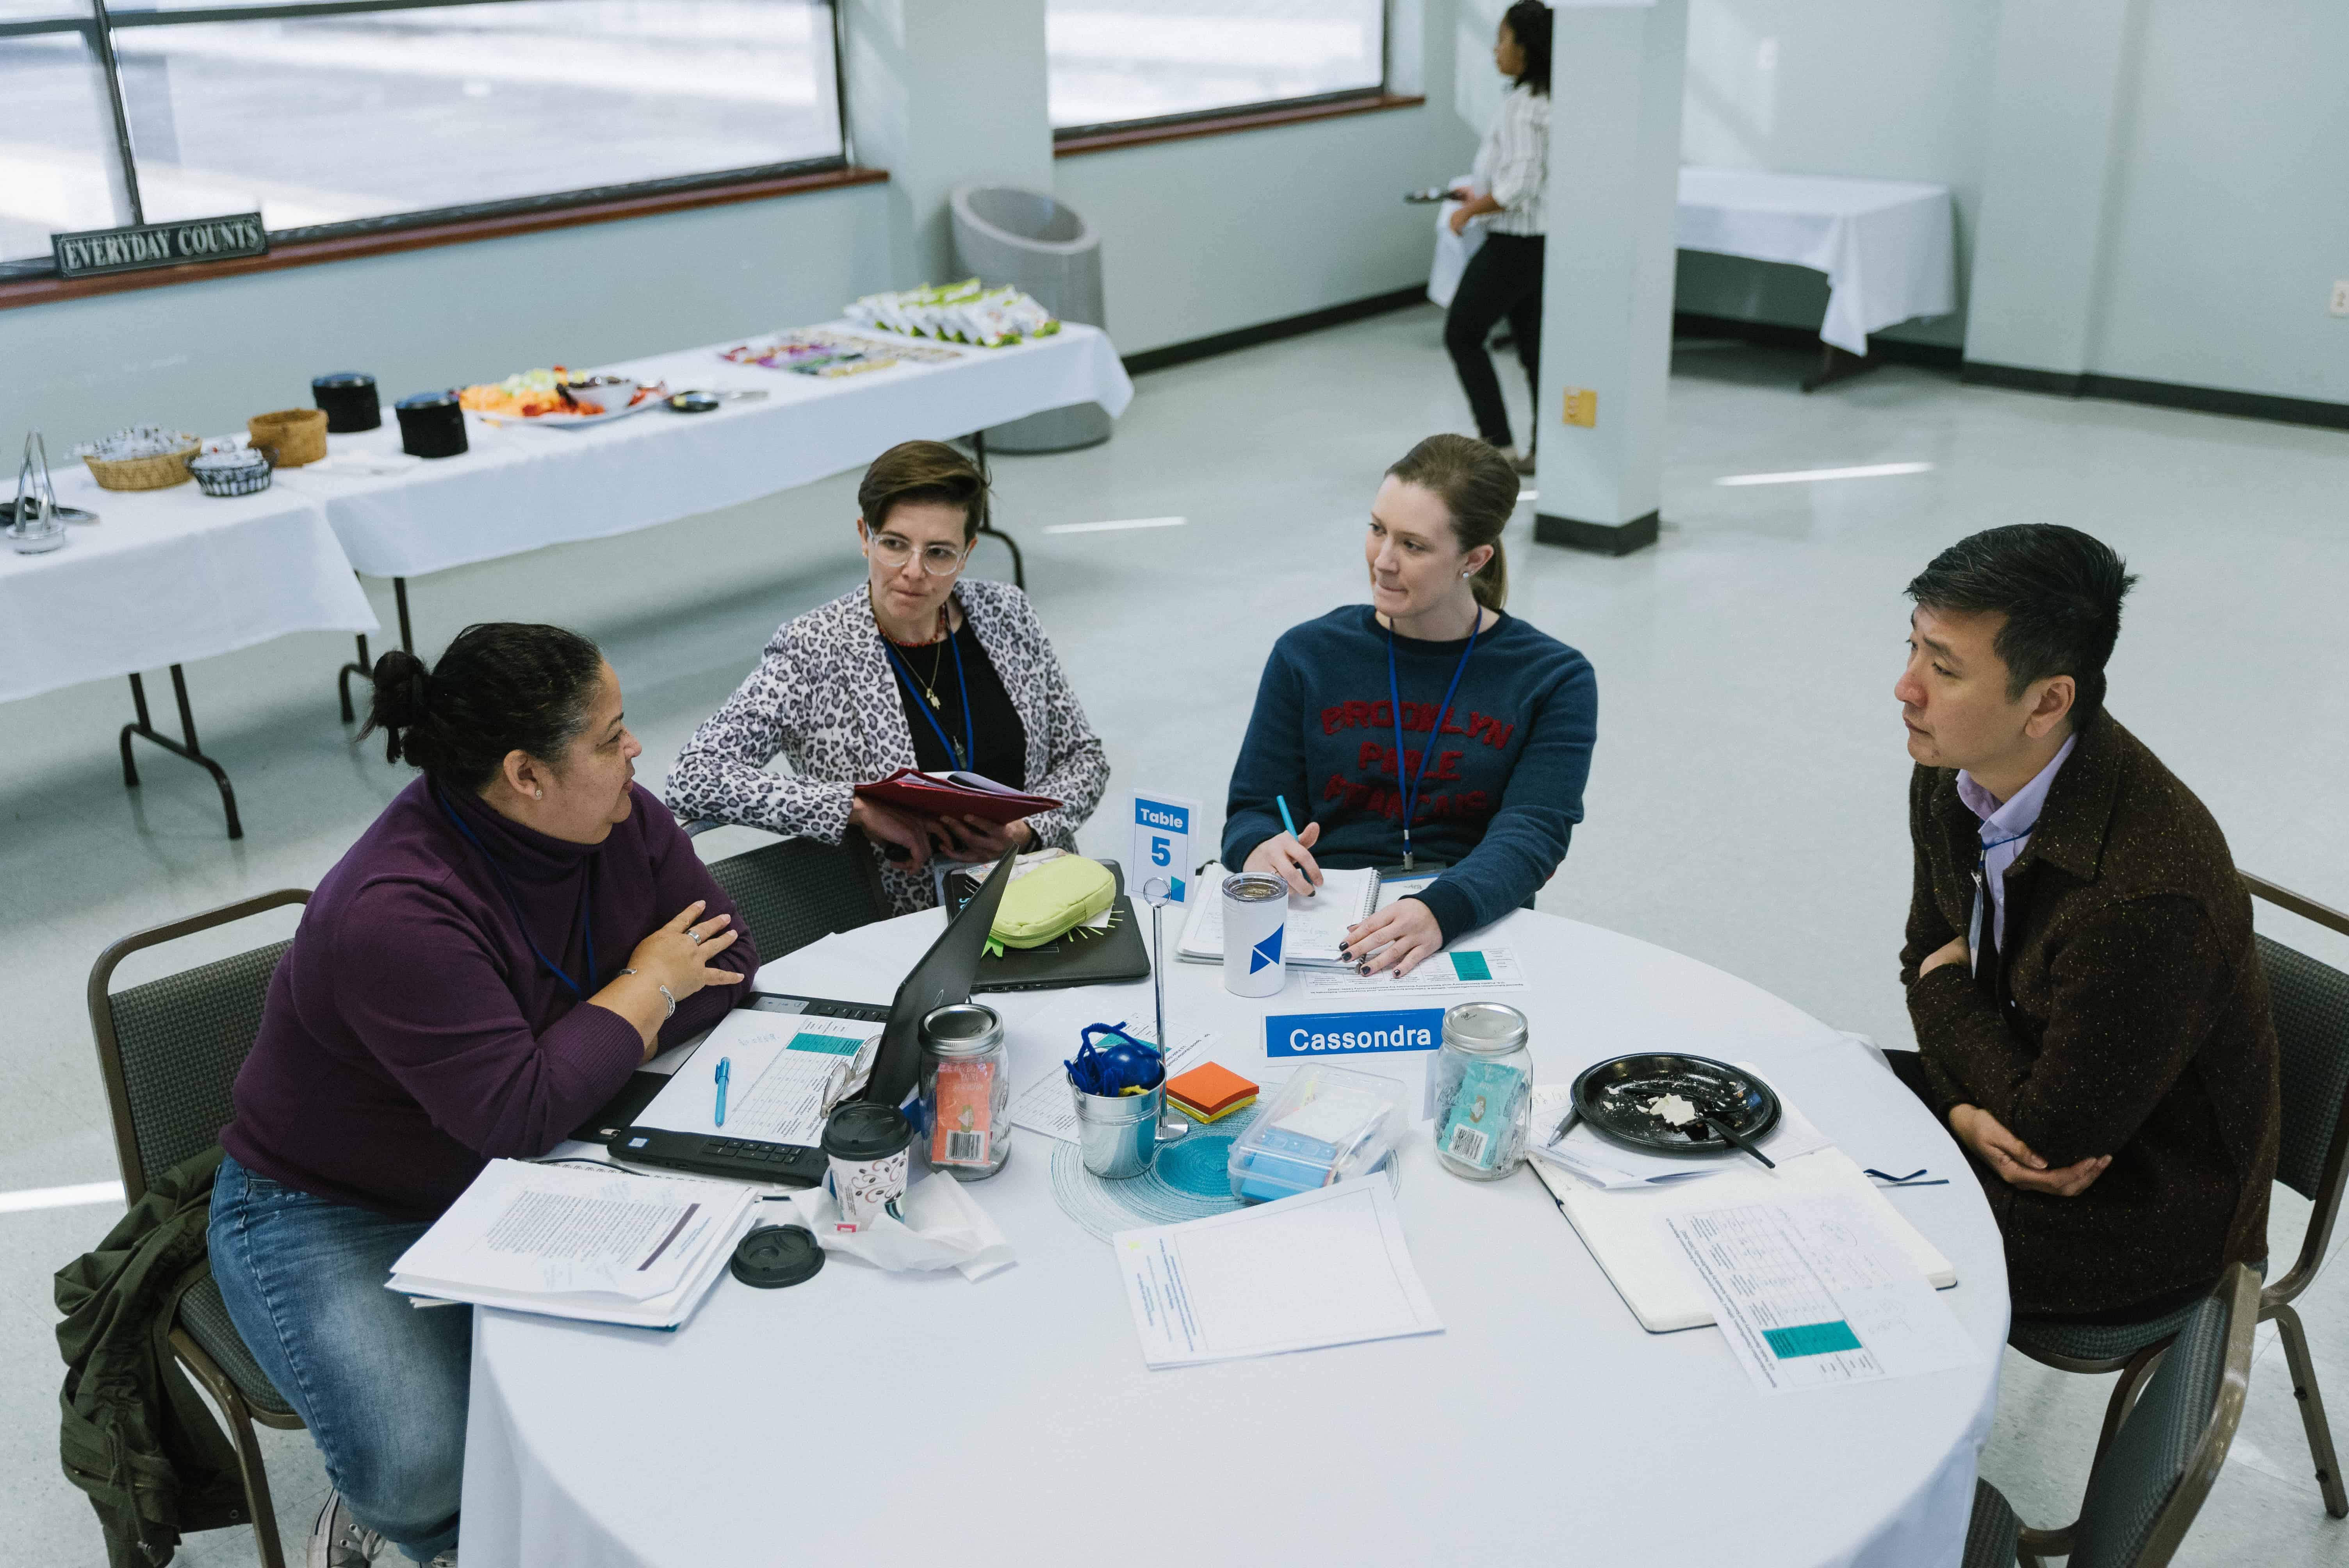 Chong-Hao Fu, Rachel Scarpato and Louisiana teachers talk around a table